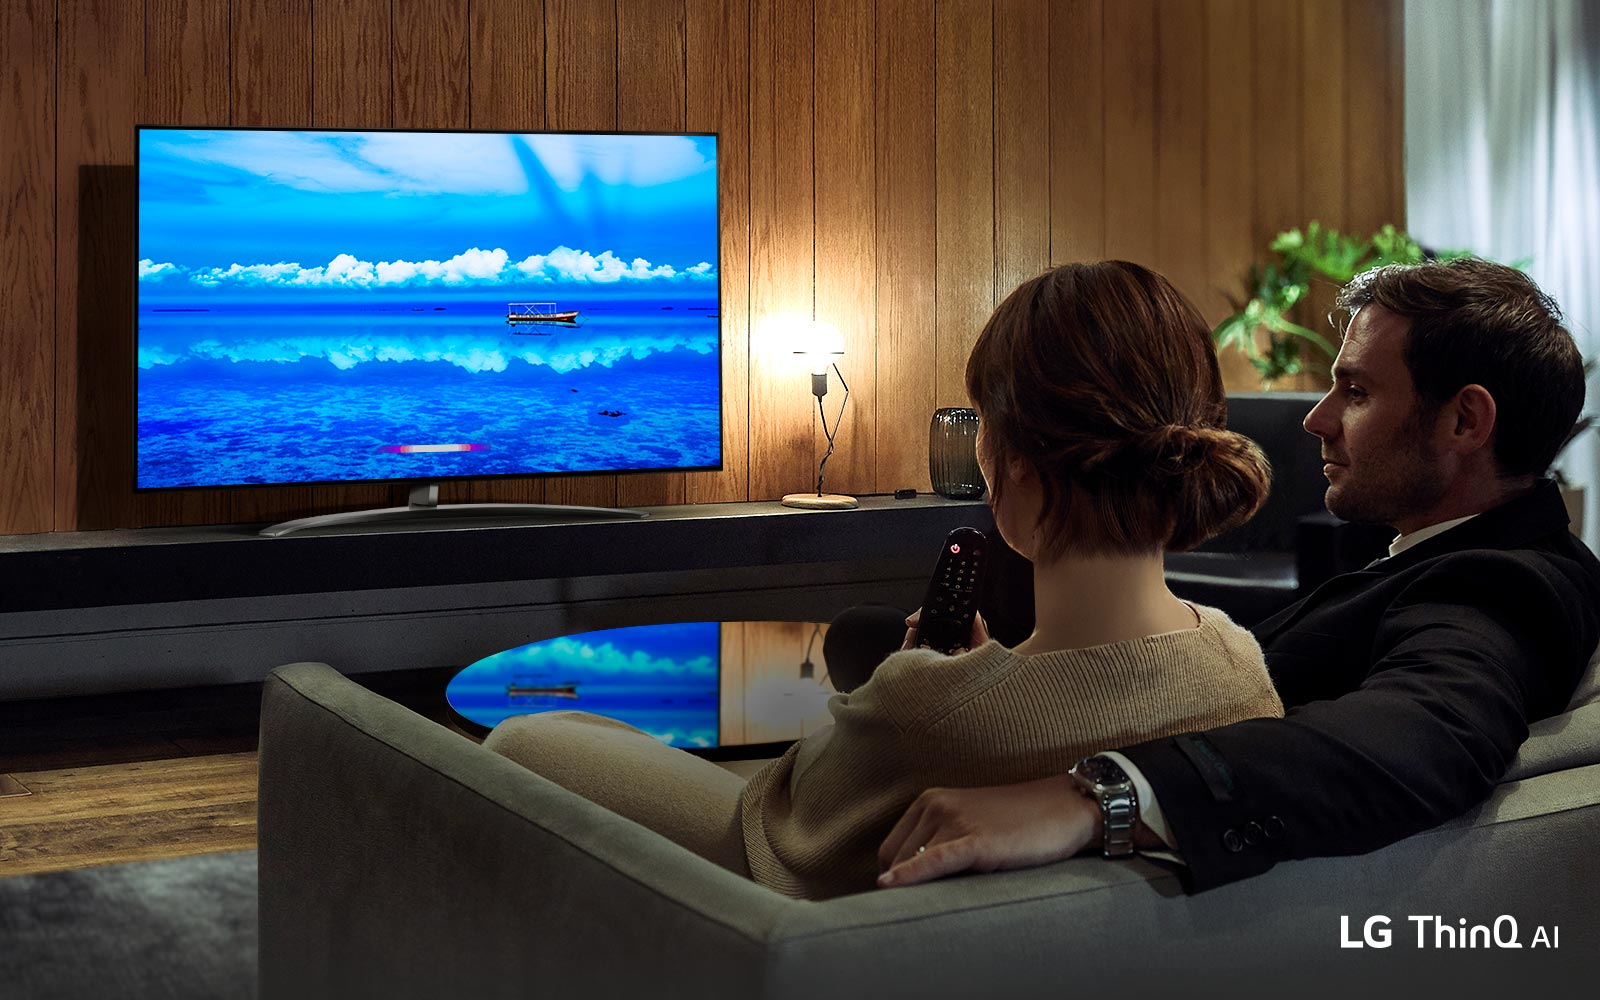 TV-NanoCell-SM85-14-Nanocell-AI-ThinQ-Desktop